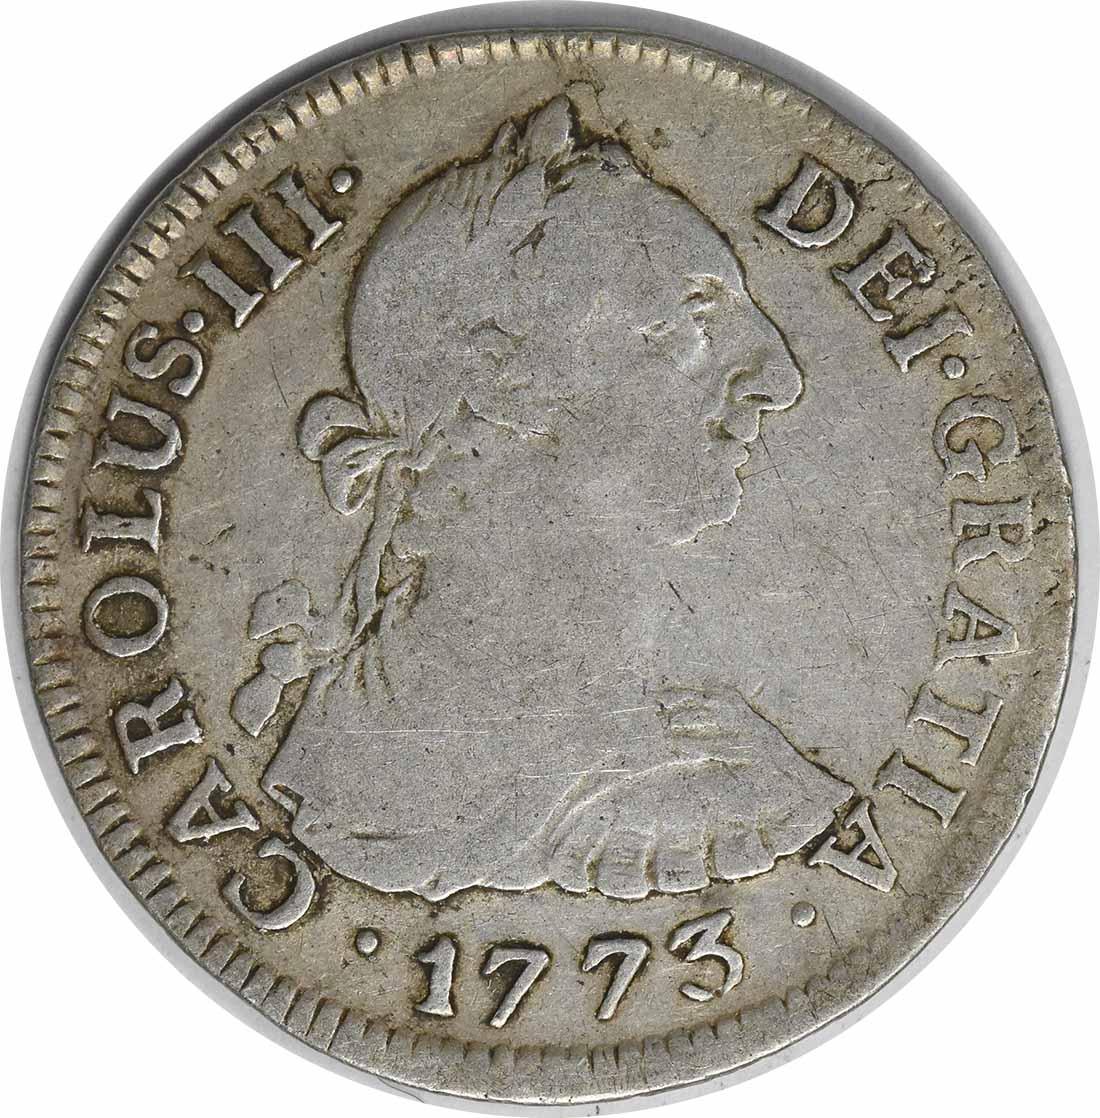 1773 JM Peru 2 Reales KM76 VF Uncertified